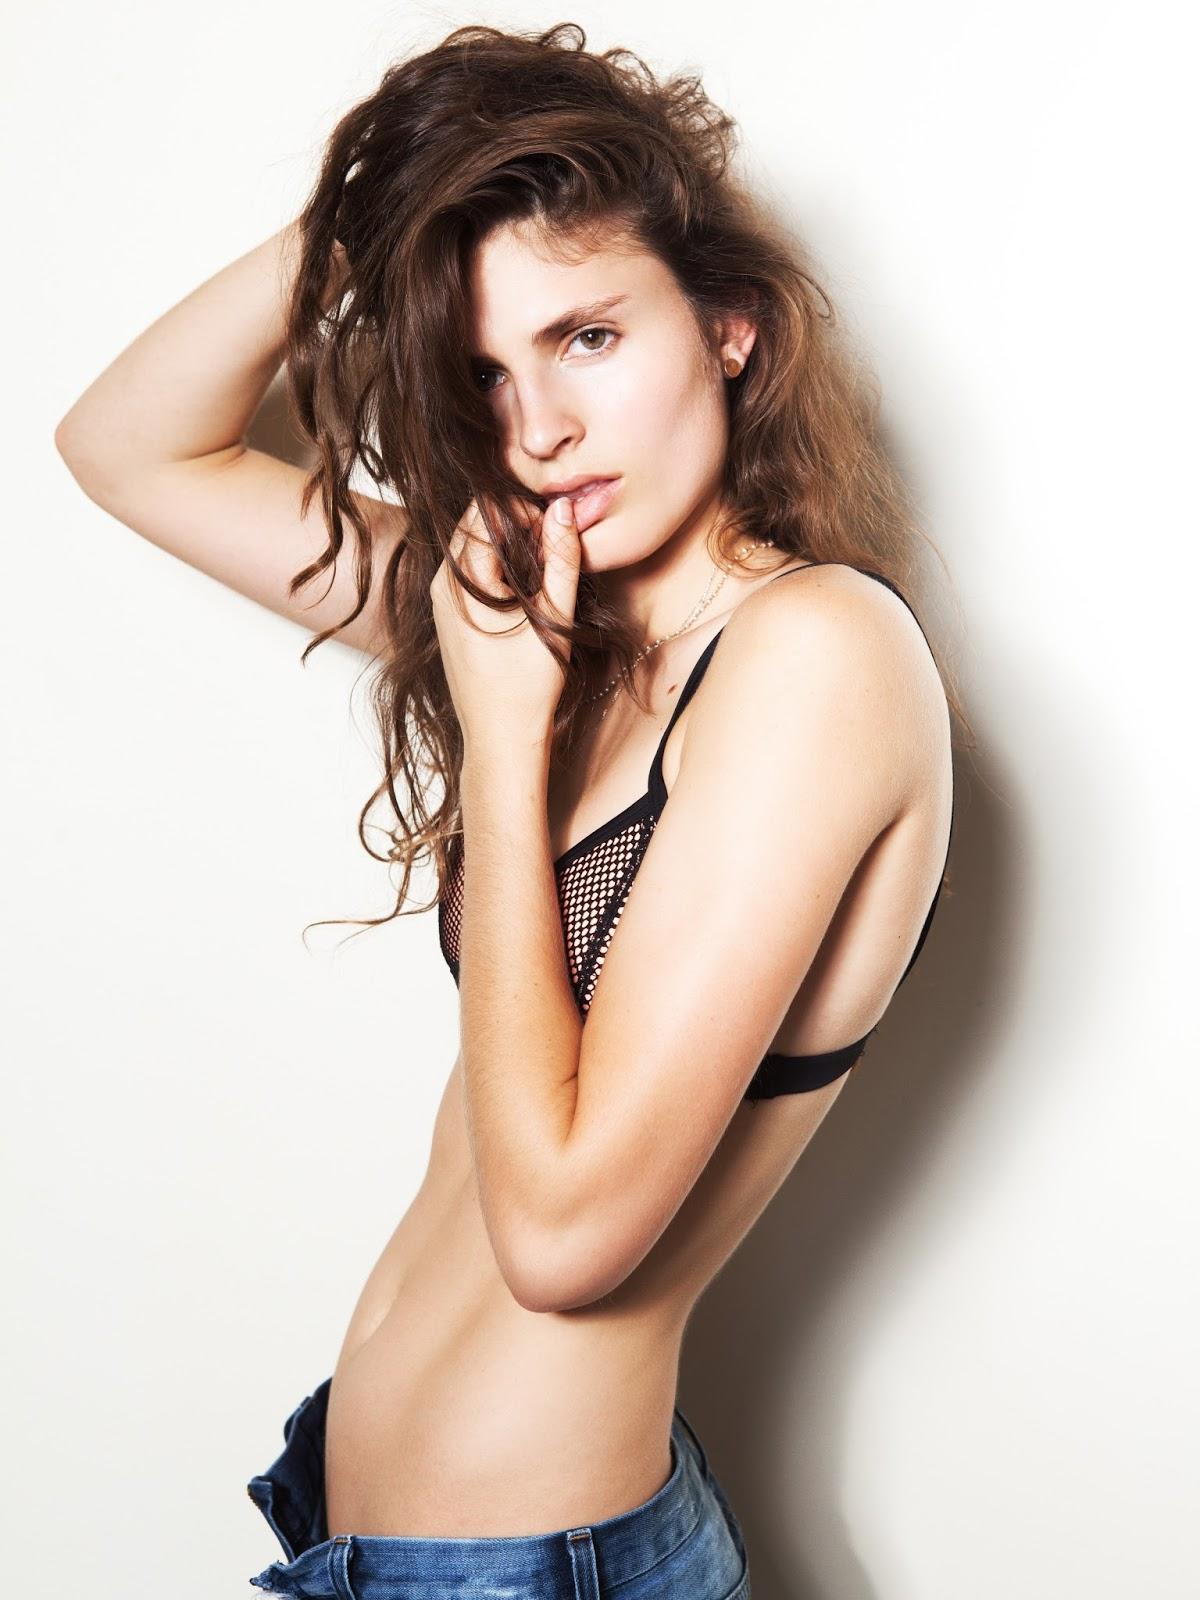 Fotos Dillon Duchesne naked (17 photos), Sexy, Leaked, Instagram, cameltoe 2015